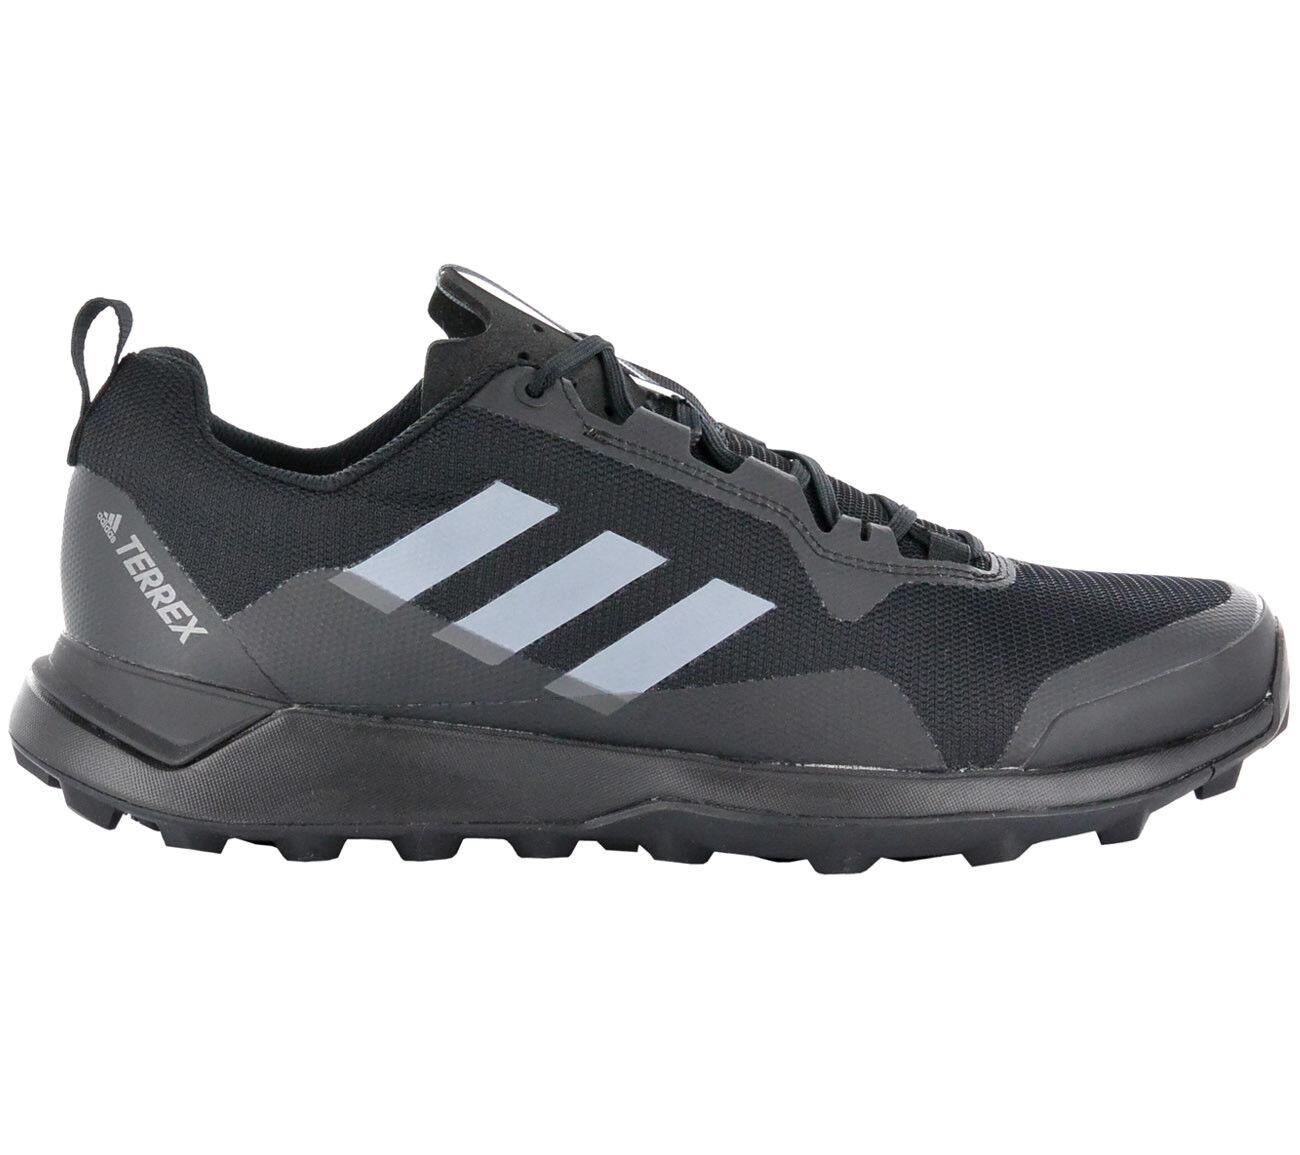 Adidas Uomo Scarpe da passeggiata Terrex AX2 GORETEX TREKKING ALL'APERTO SCARPE